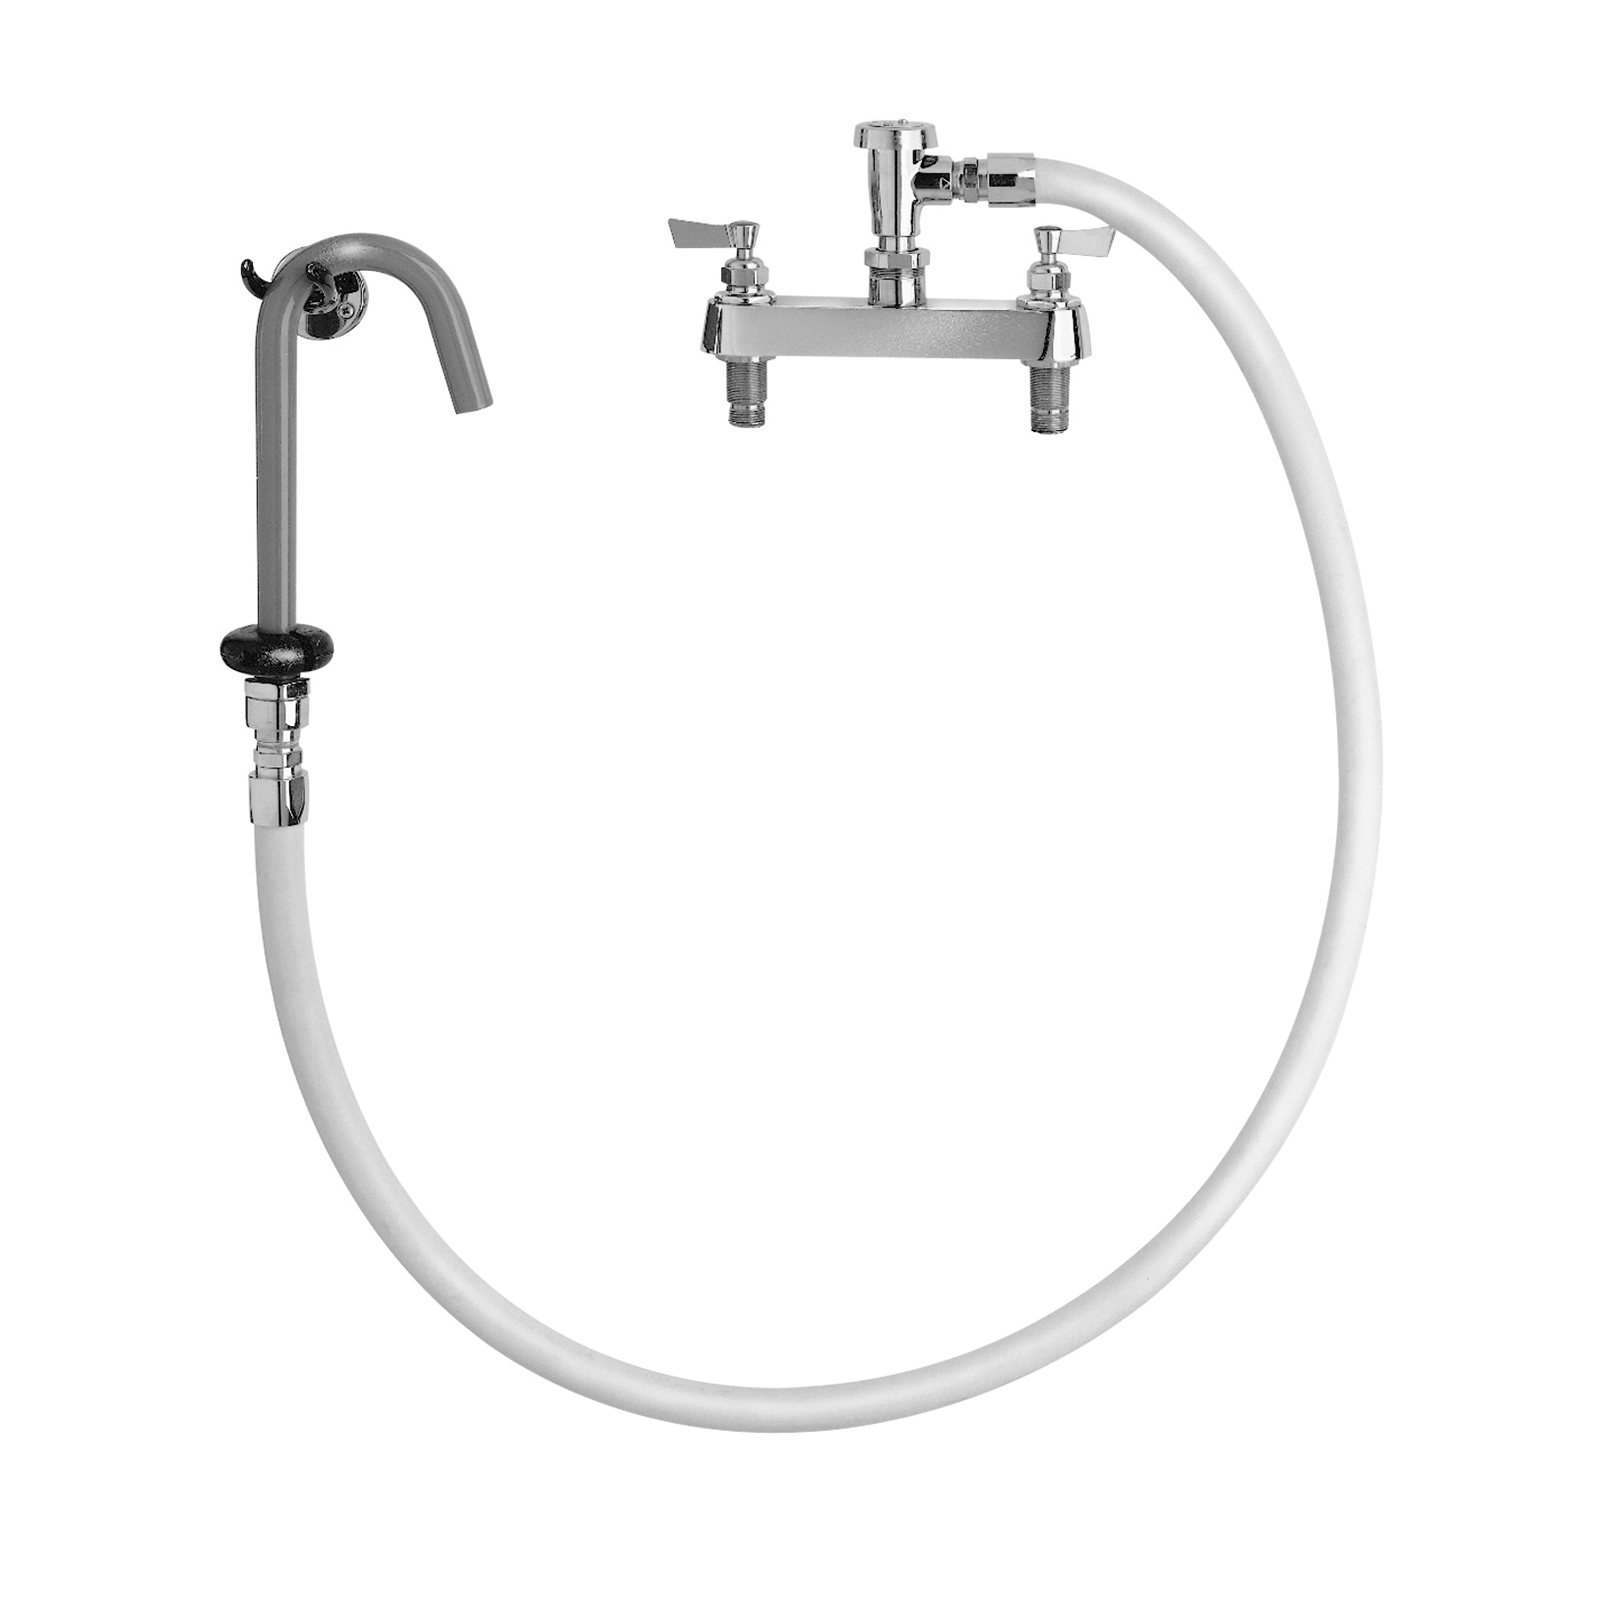 Fisher 5340 faucet, kettle / pot filler